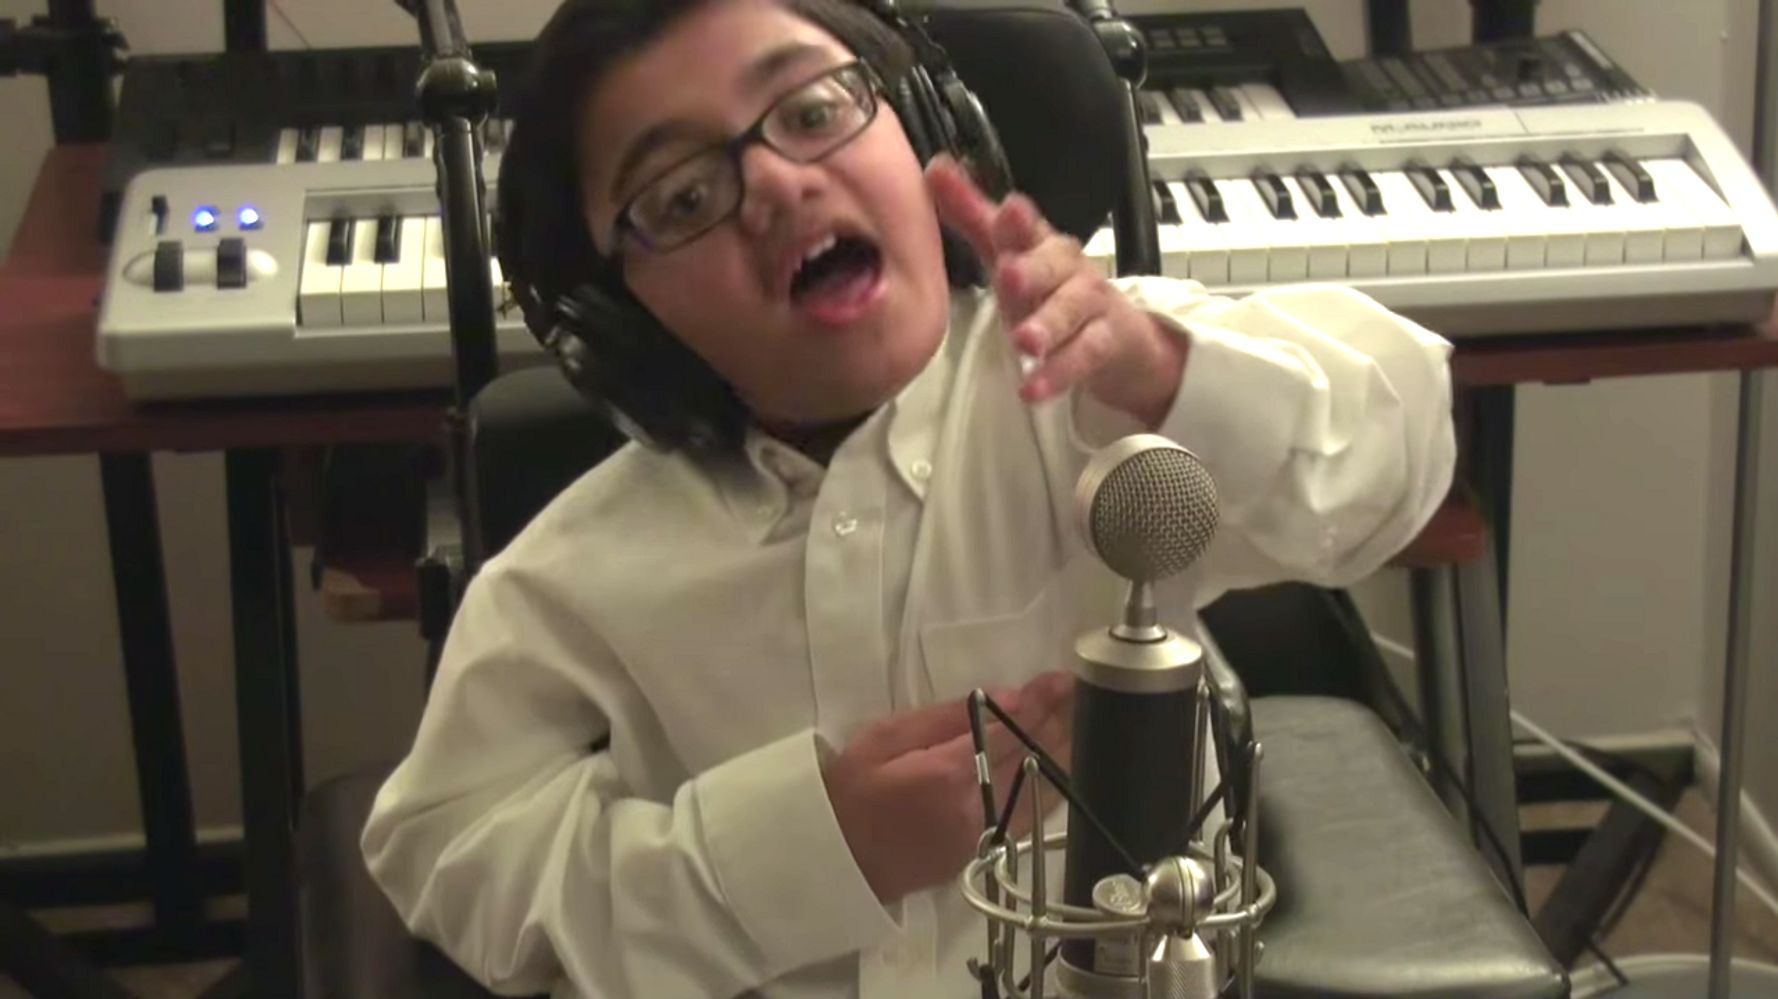 Fearless Boy Who Has Incurable Disease Sings Eminem's 'Not